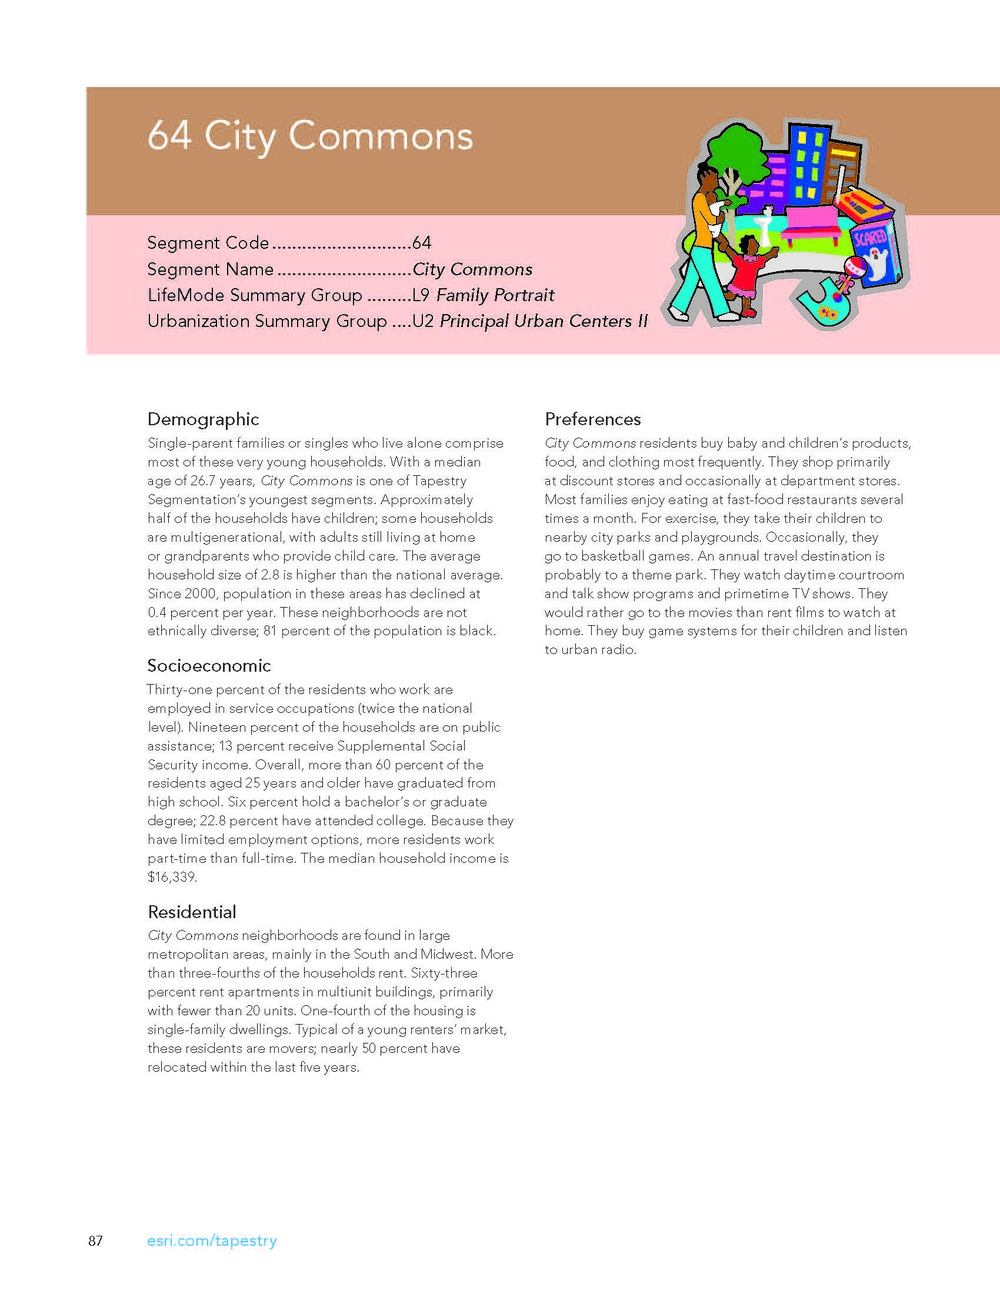 tapestry-segmentation_Page_90.jpg